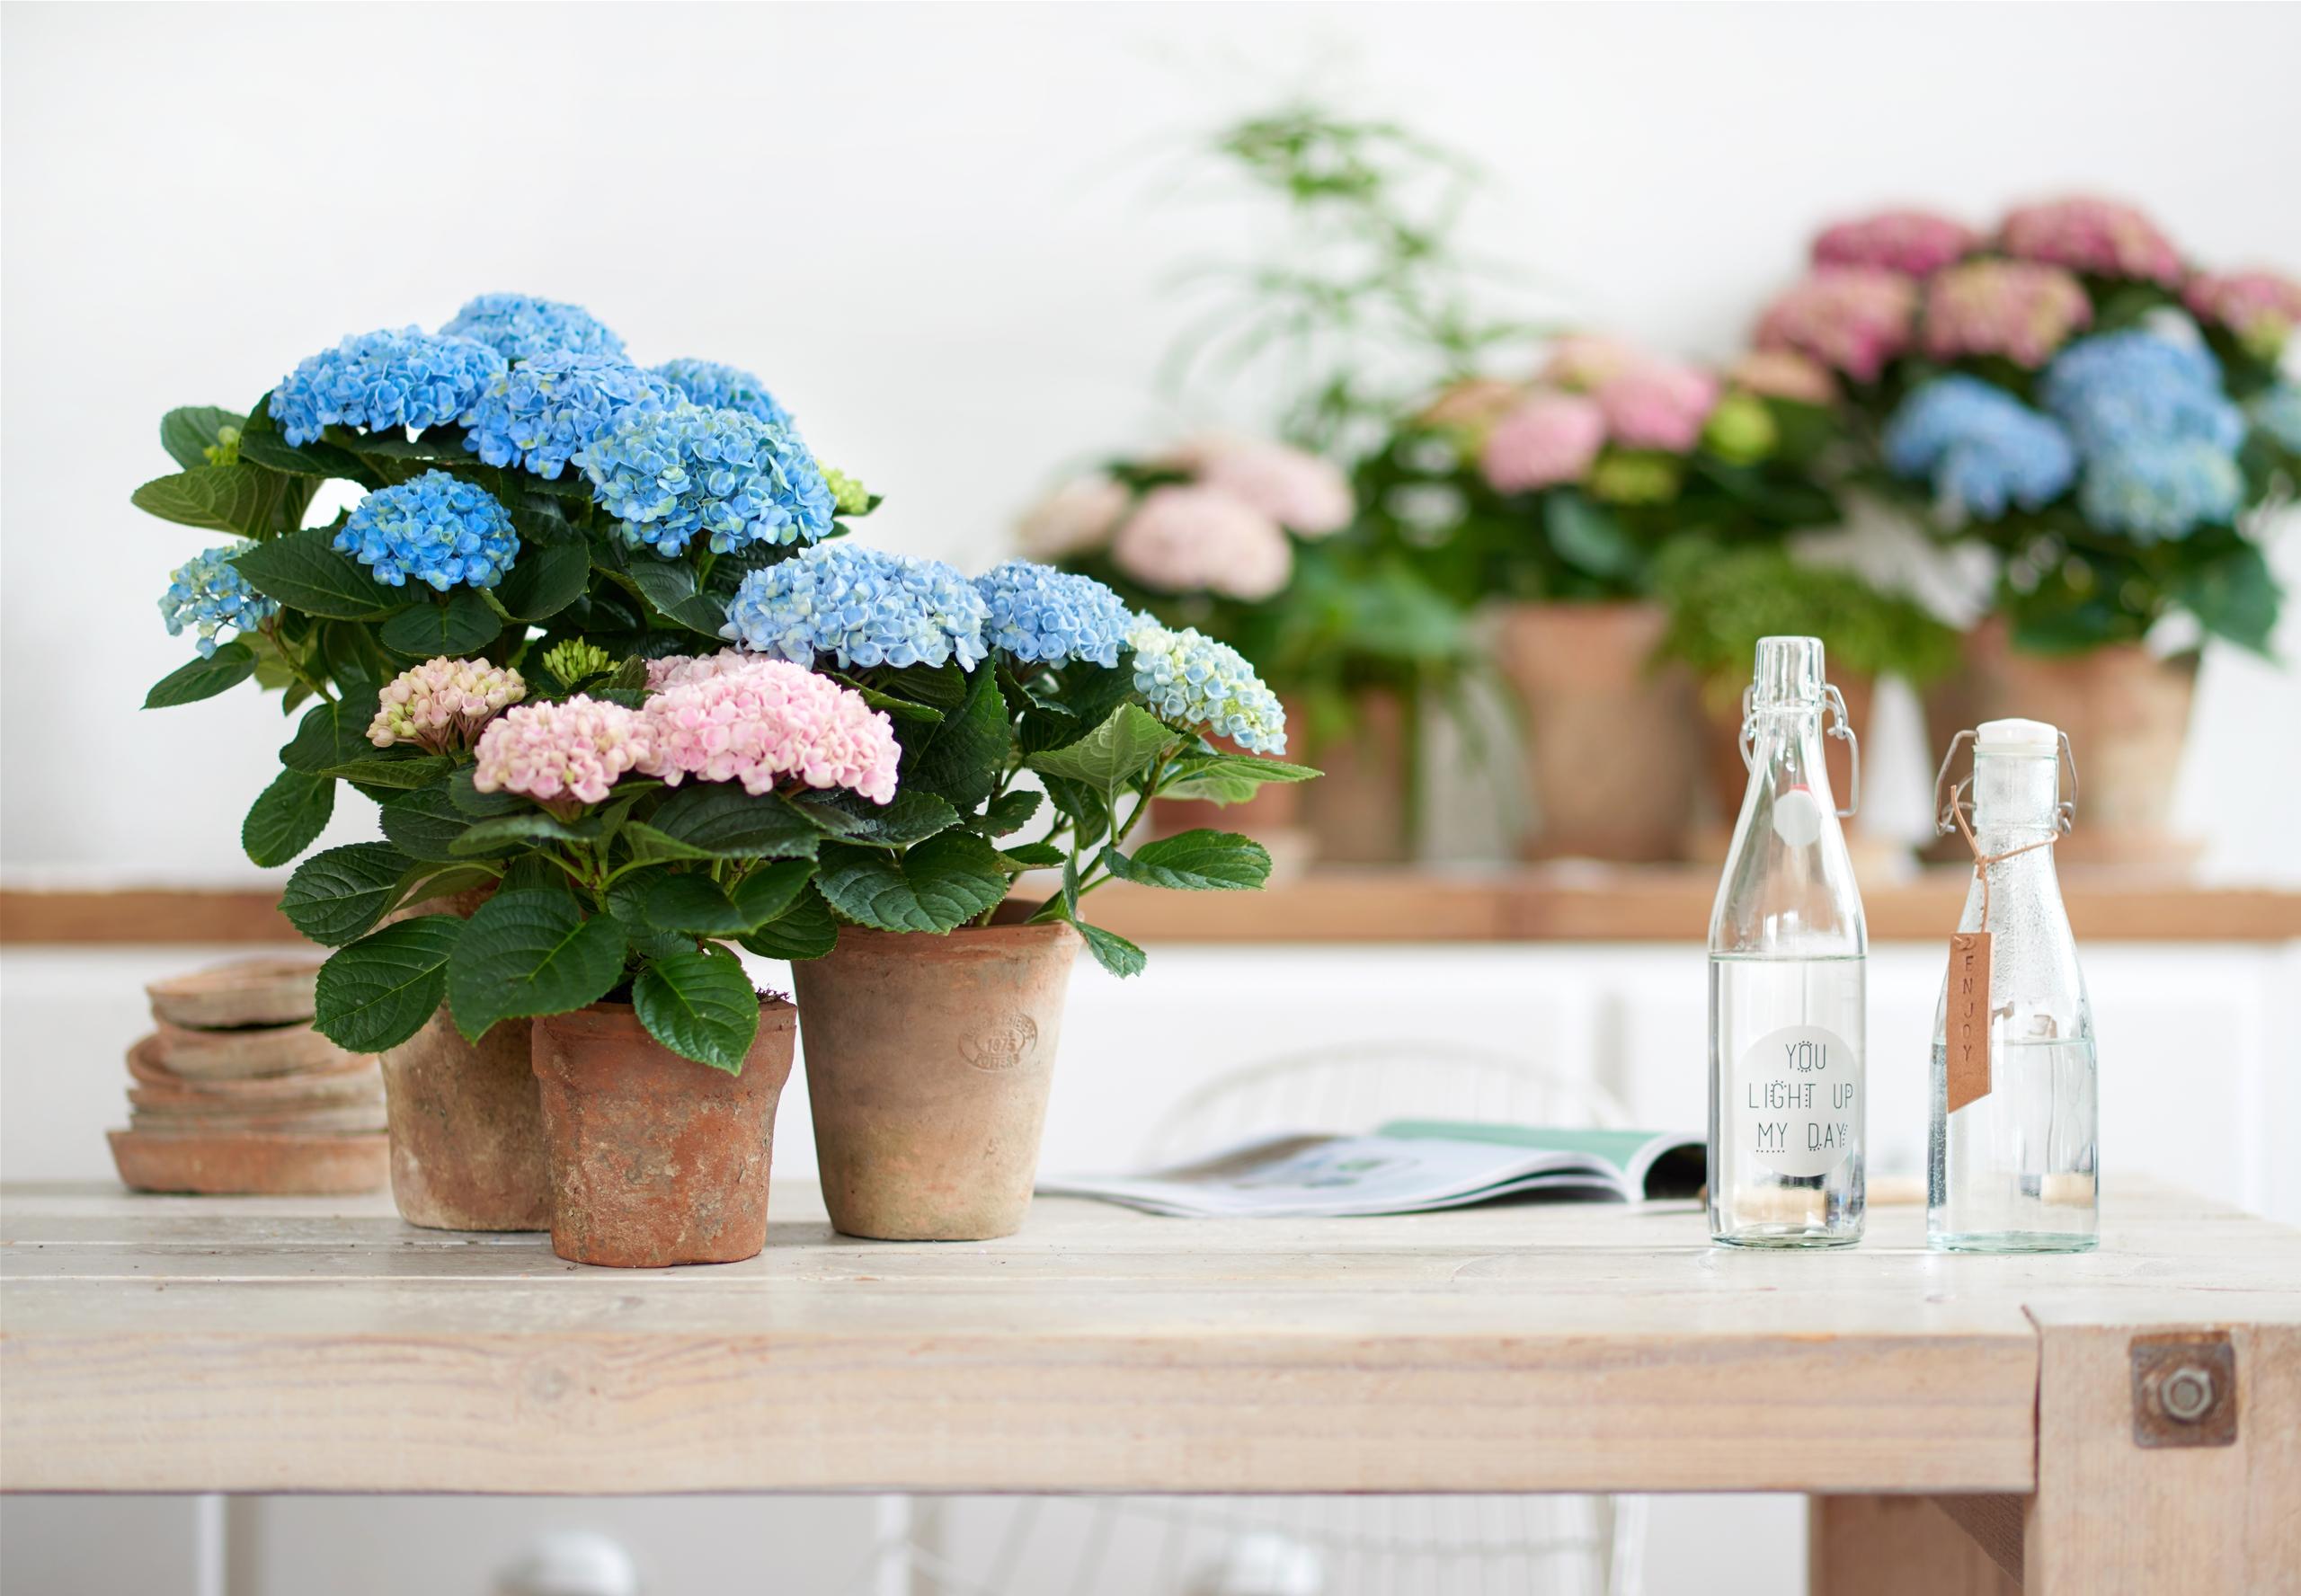 Hortenzijos vazonuose